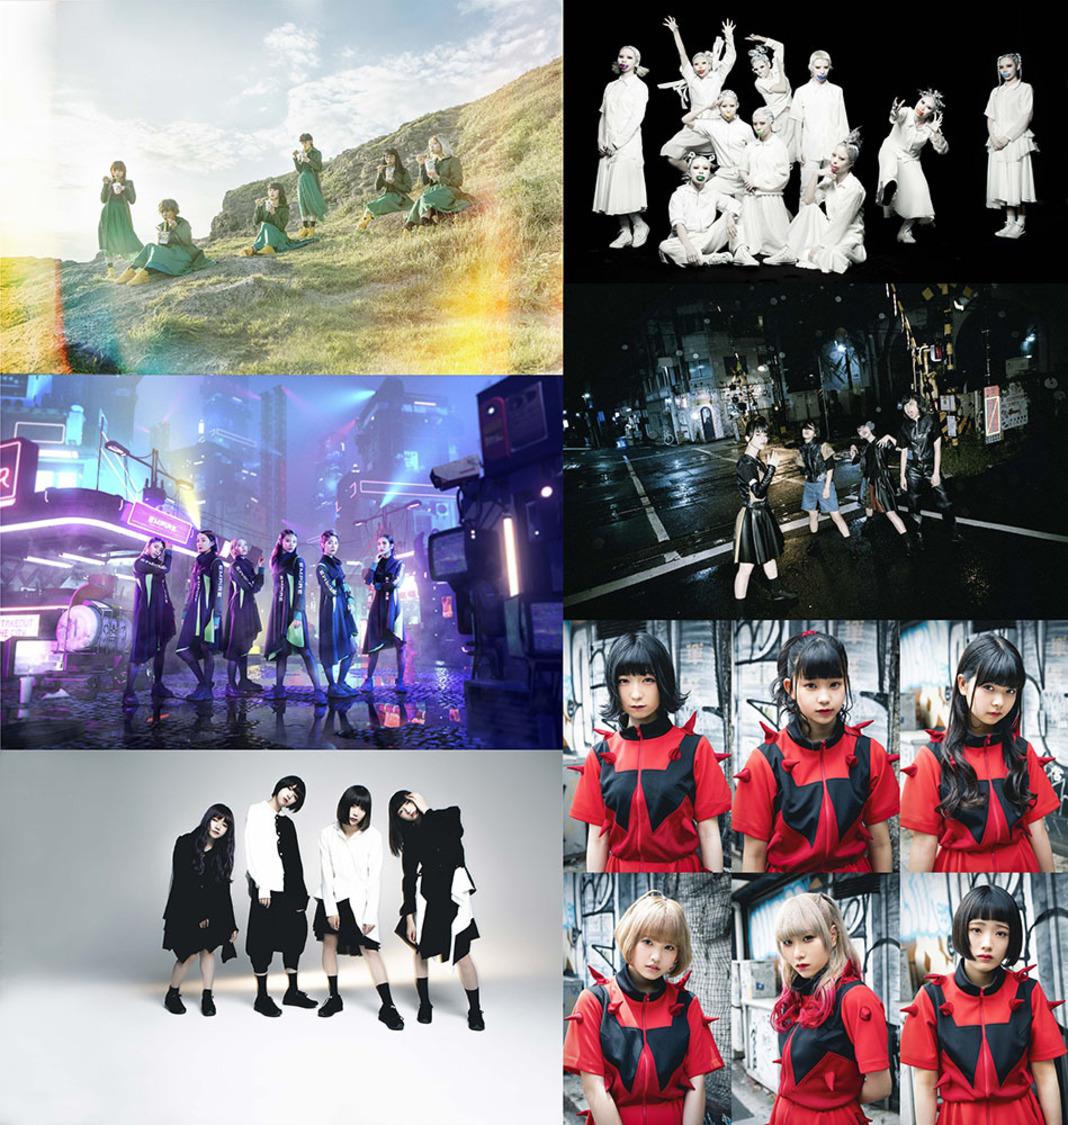 BiSH、ギャンパレ、二丁魁、ZOCら、タワレコ日本上陸40周年記念ライブ出演決定!